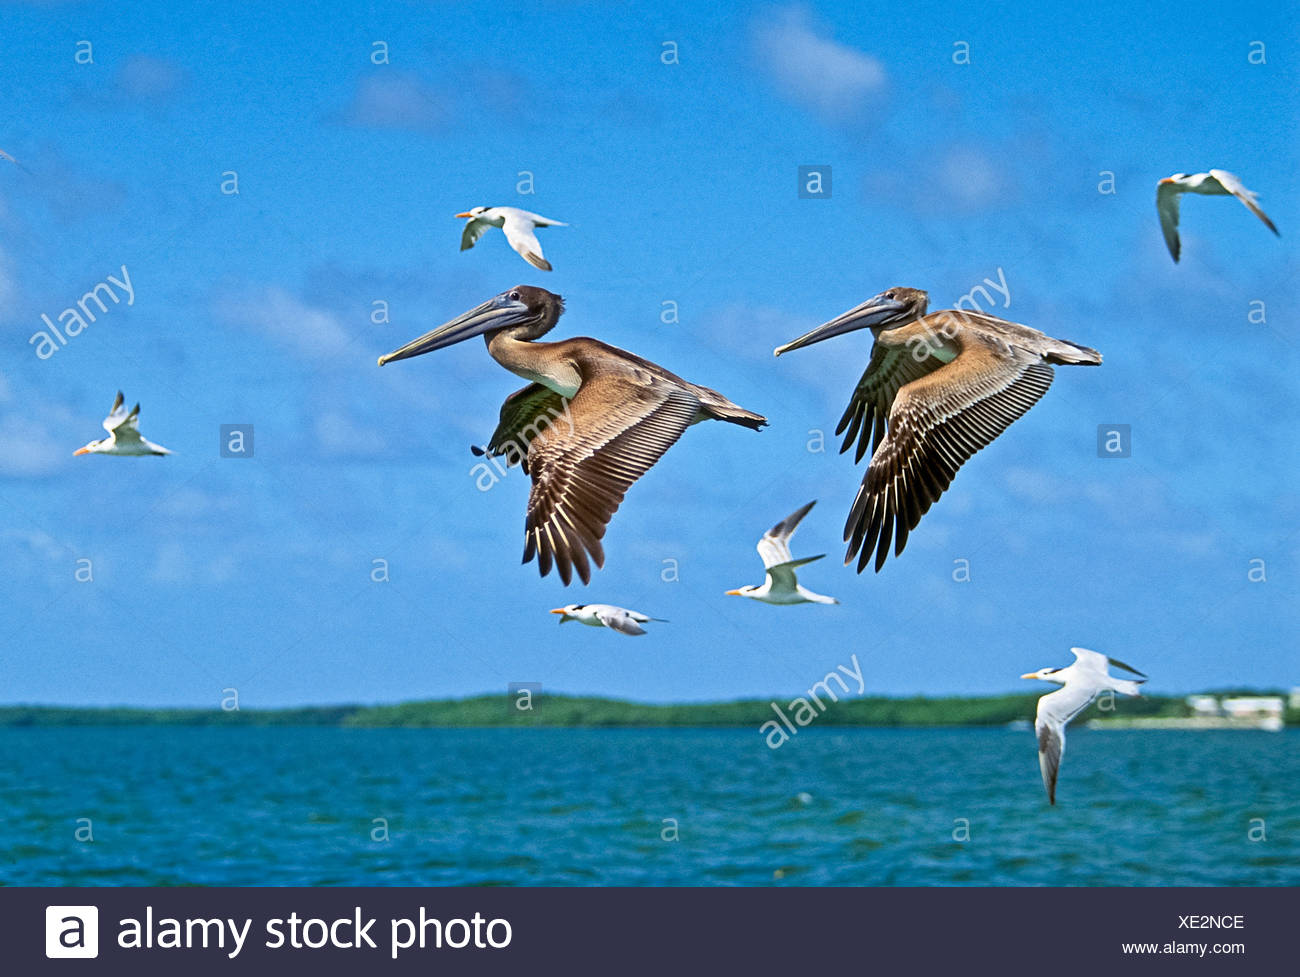 Juvenile Brown Pelicans flying, Pelecanus occidentalis, Key Largo, Florida, USA - Stock Image